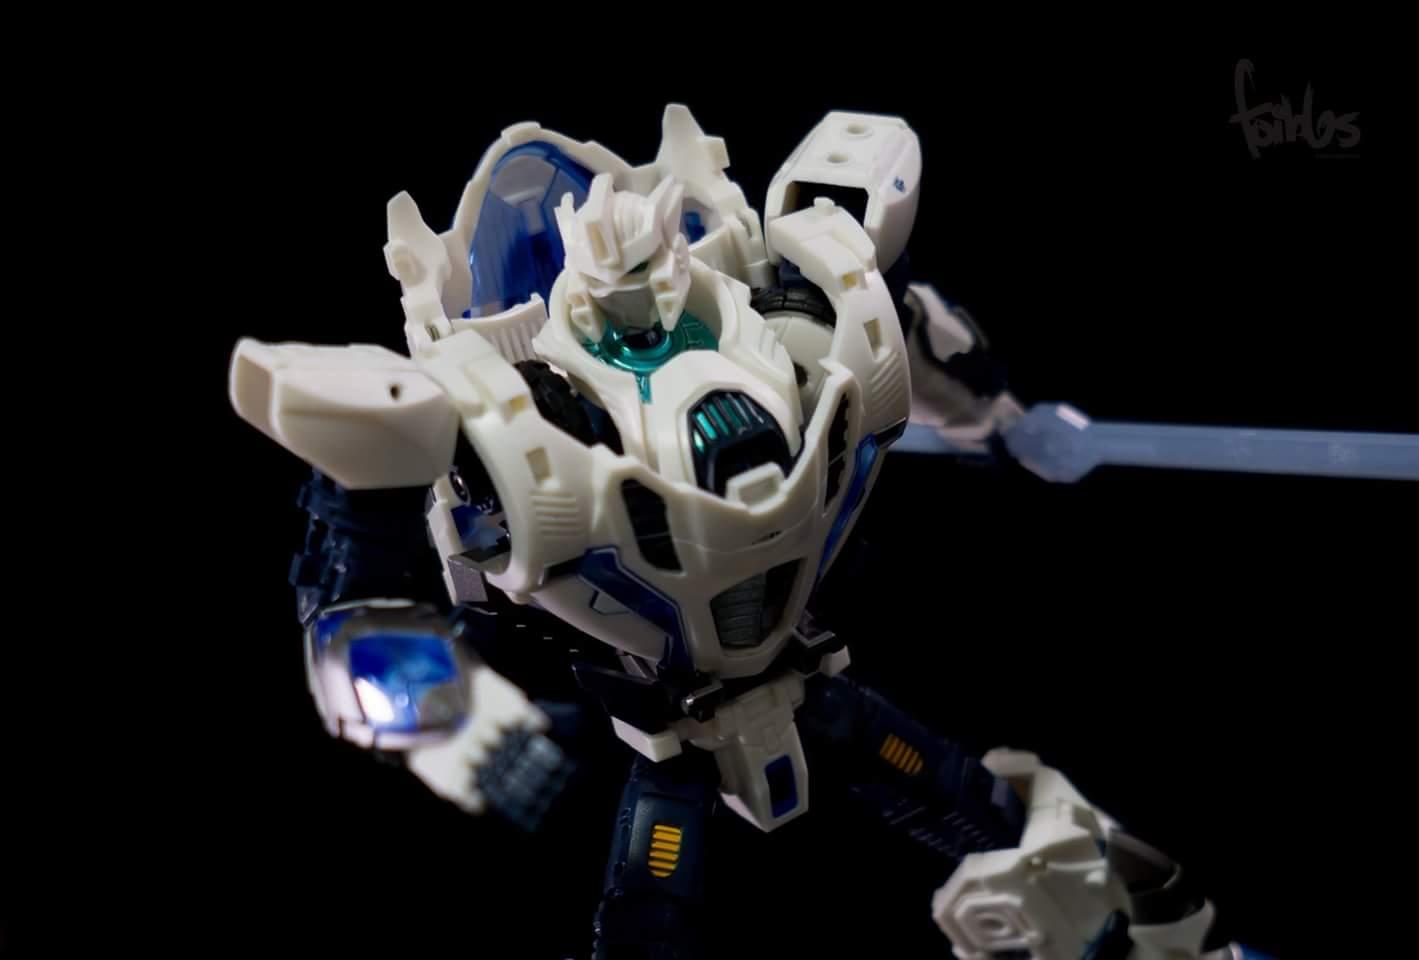 [Mastermind Creations] Produit Tiers - Reformatted R-11 Seraphicus Prominon - aka Nova Prime LFIqRkq0